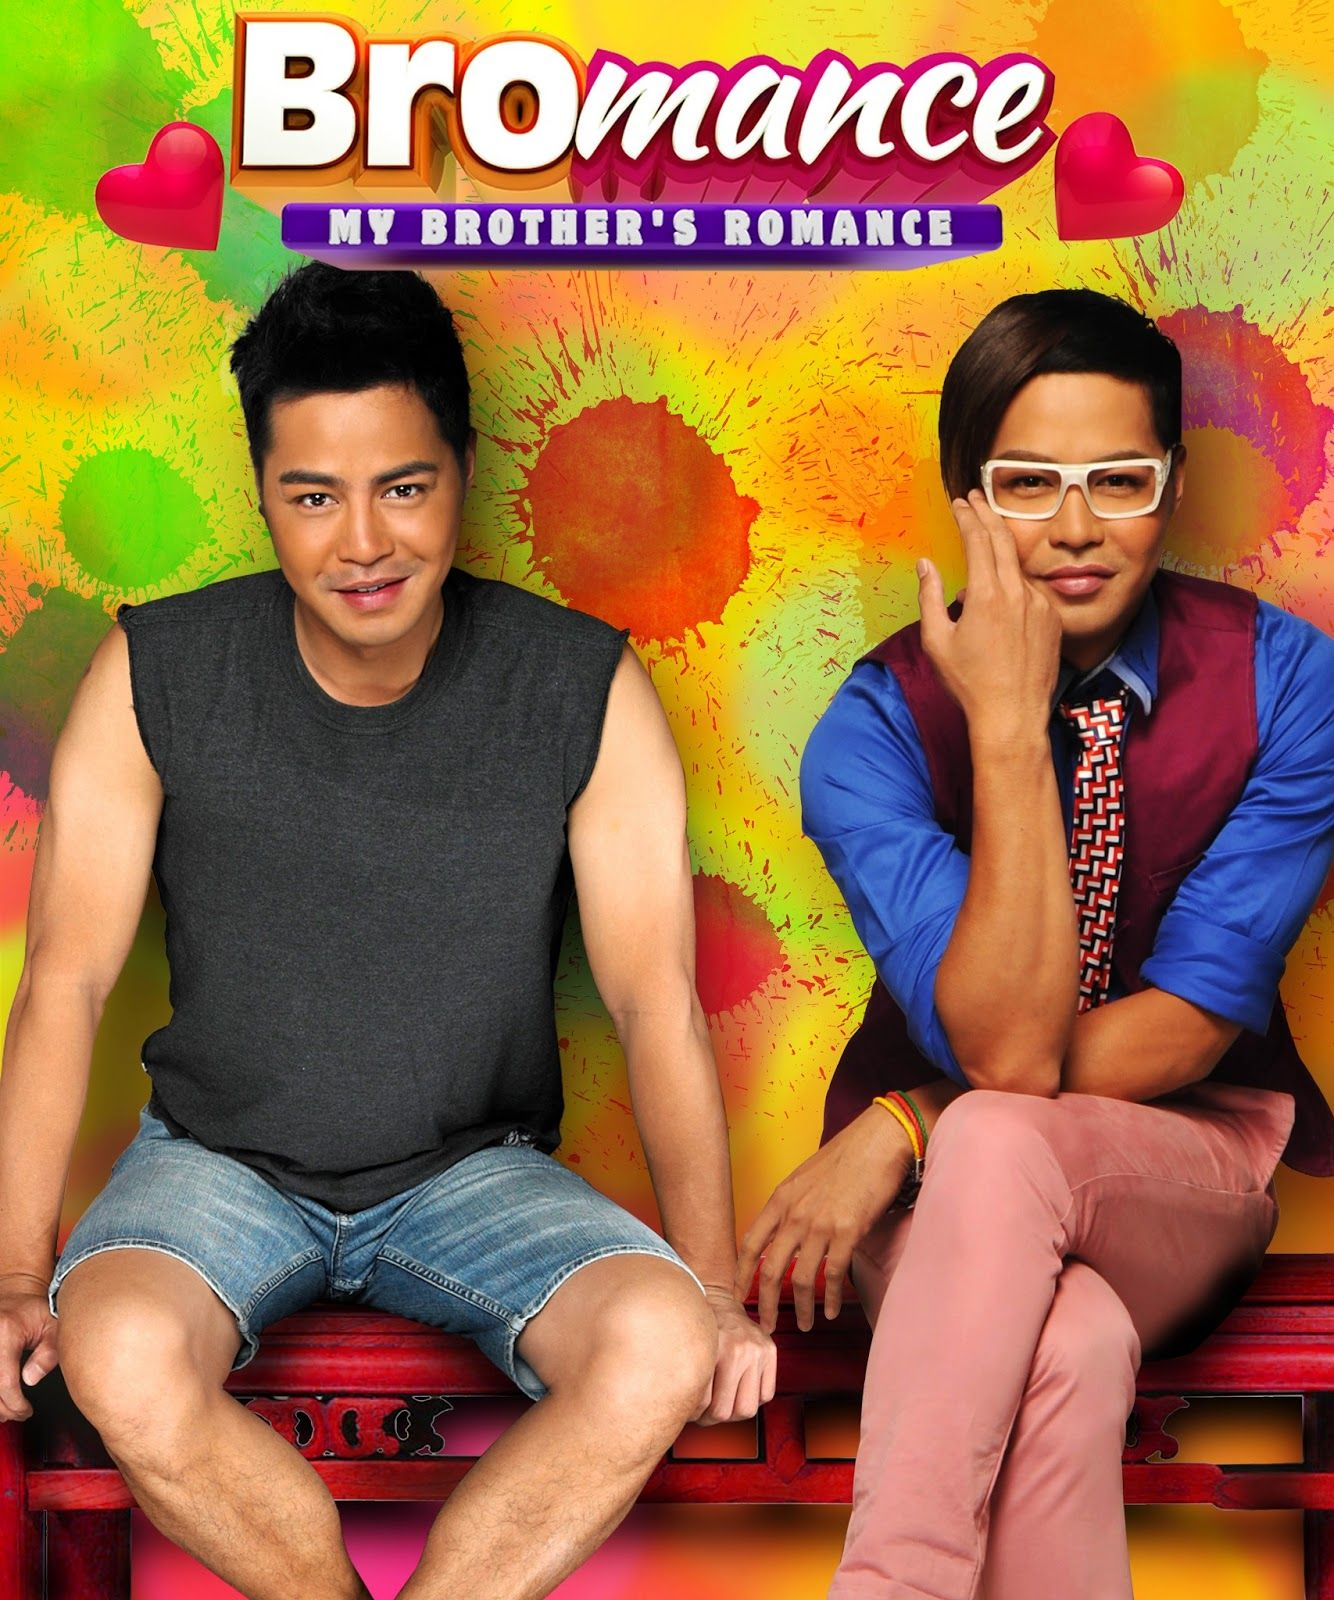 Bromance My Brother S Romance 2013 Zanjoe Marudo Tagalog Comedy Movies Comedy Movies Movies Comedy